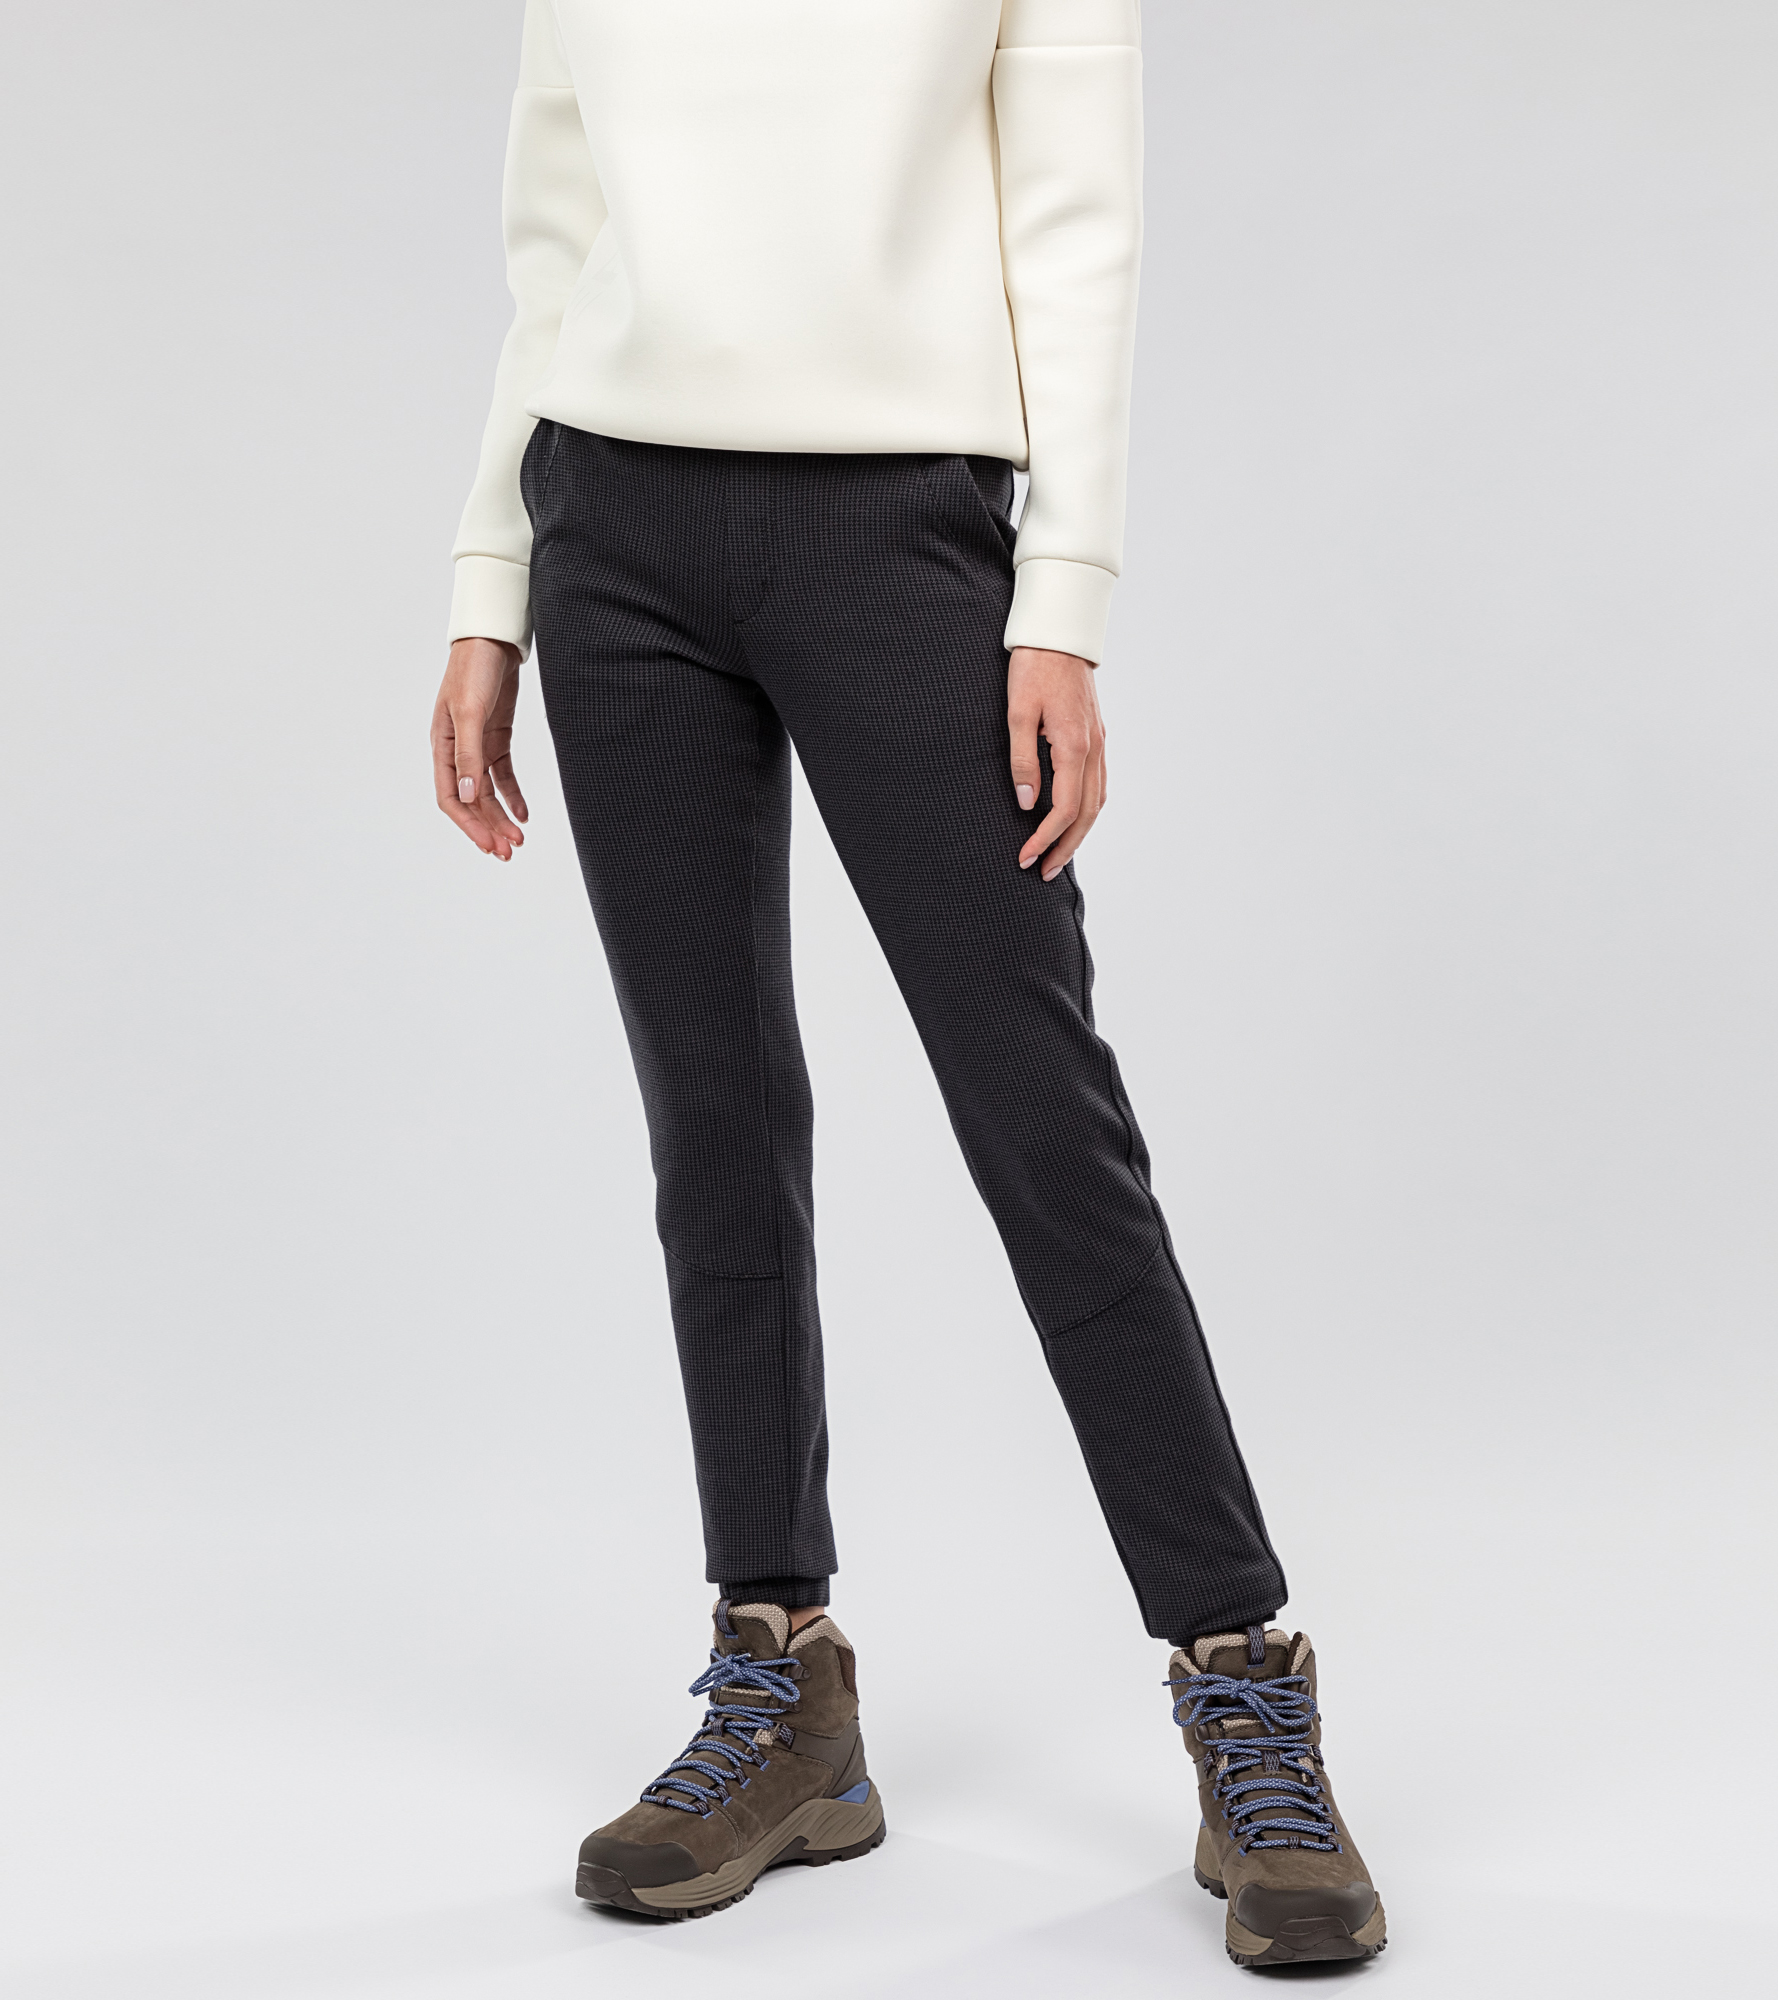 Merrell Брюки женские Merrell, размер 50 merrell шорты женские merrell